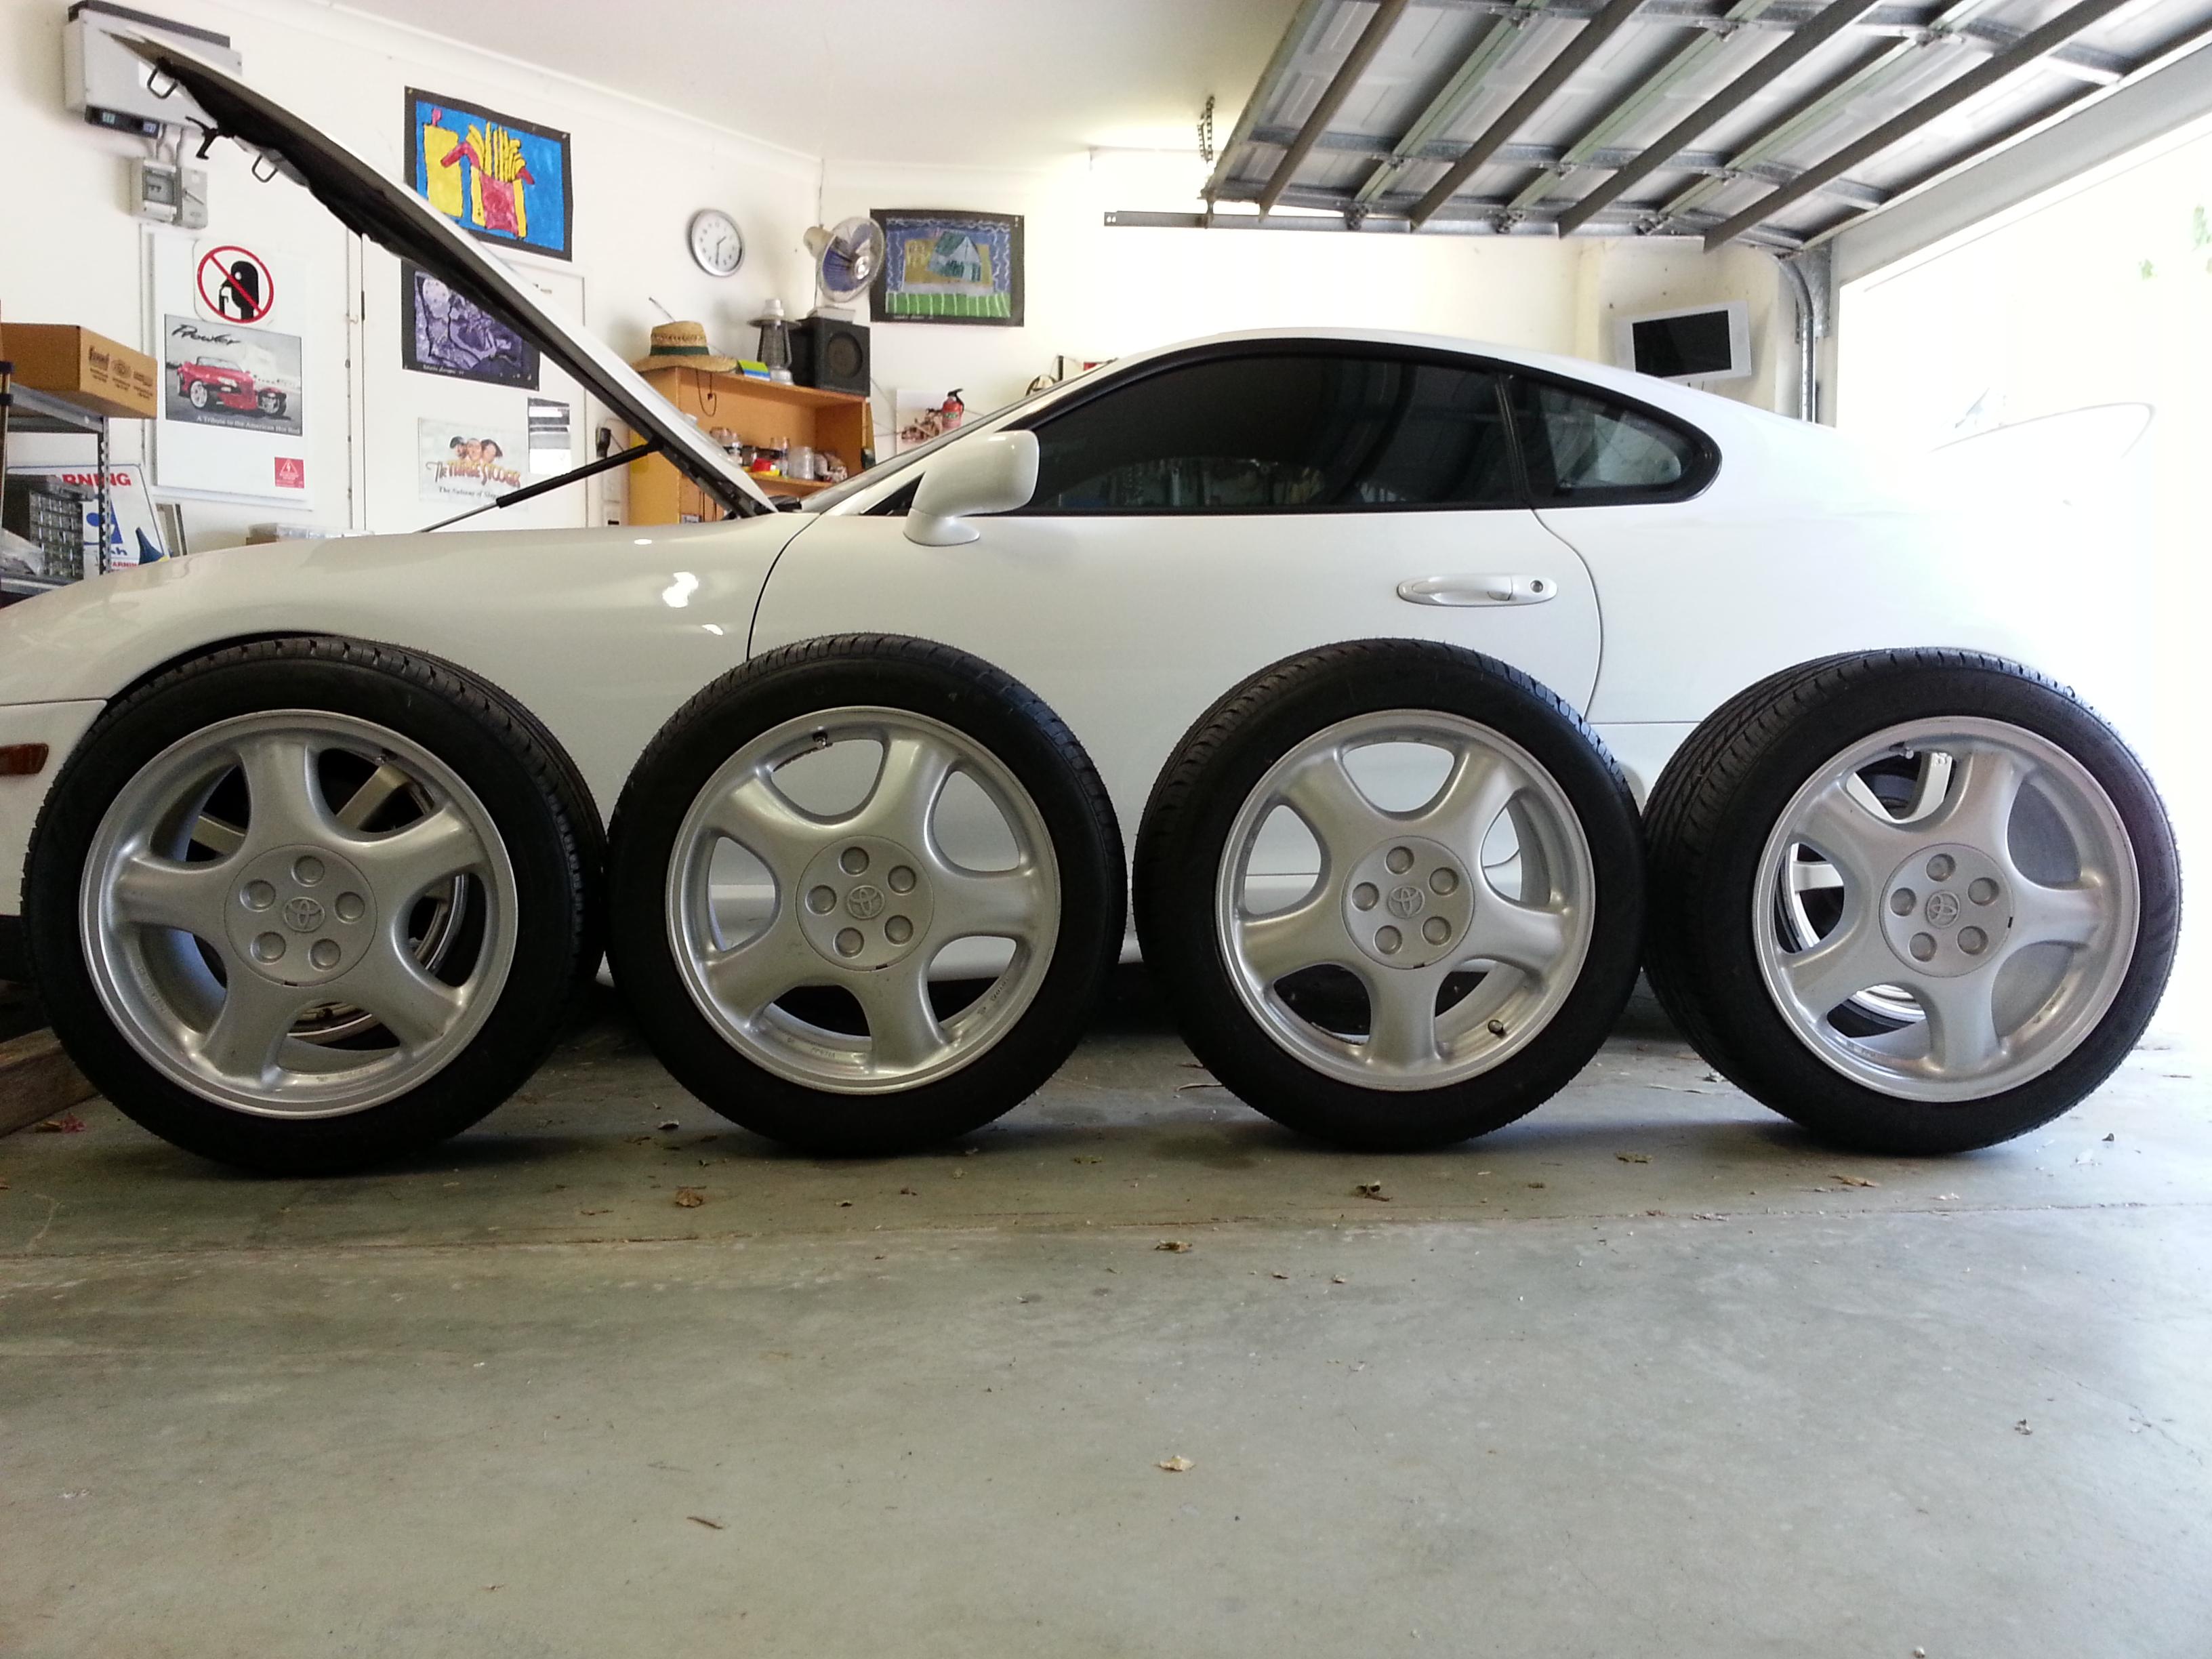 2002 Toyota Supra RZ-S 3L twin turbo 6 speed manual factory alloy wheels